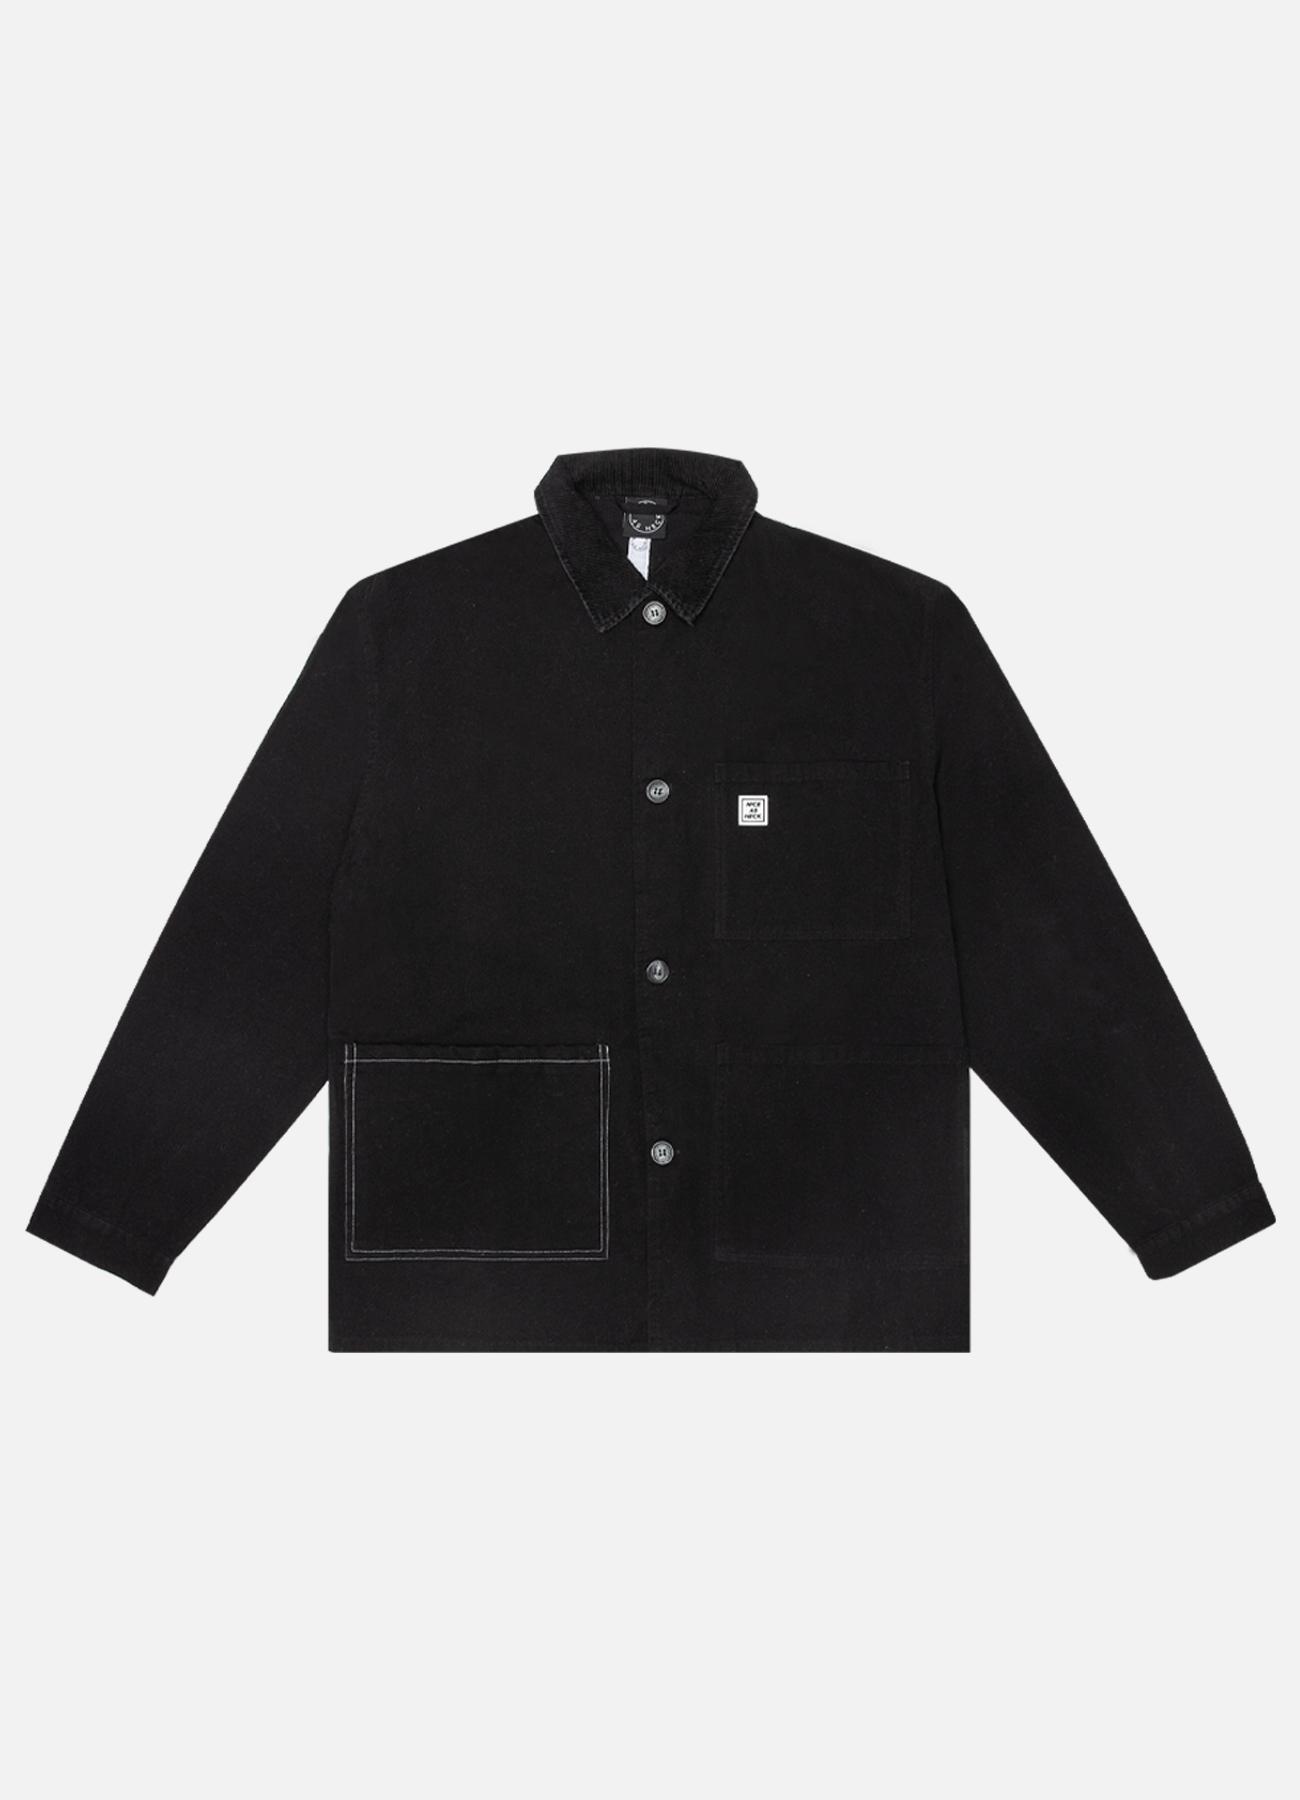 Kickback Jacket